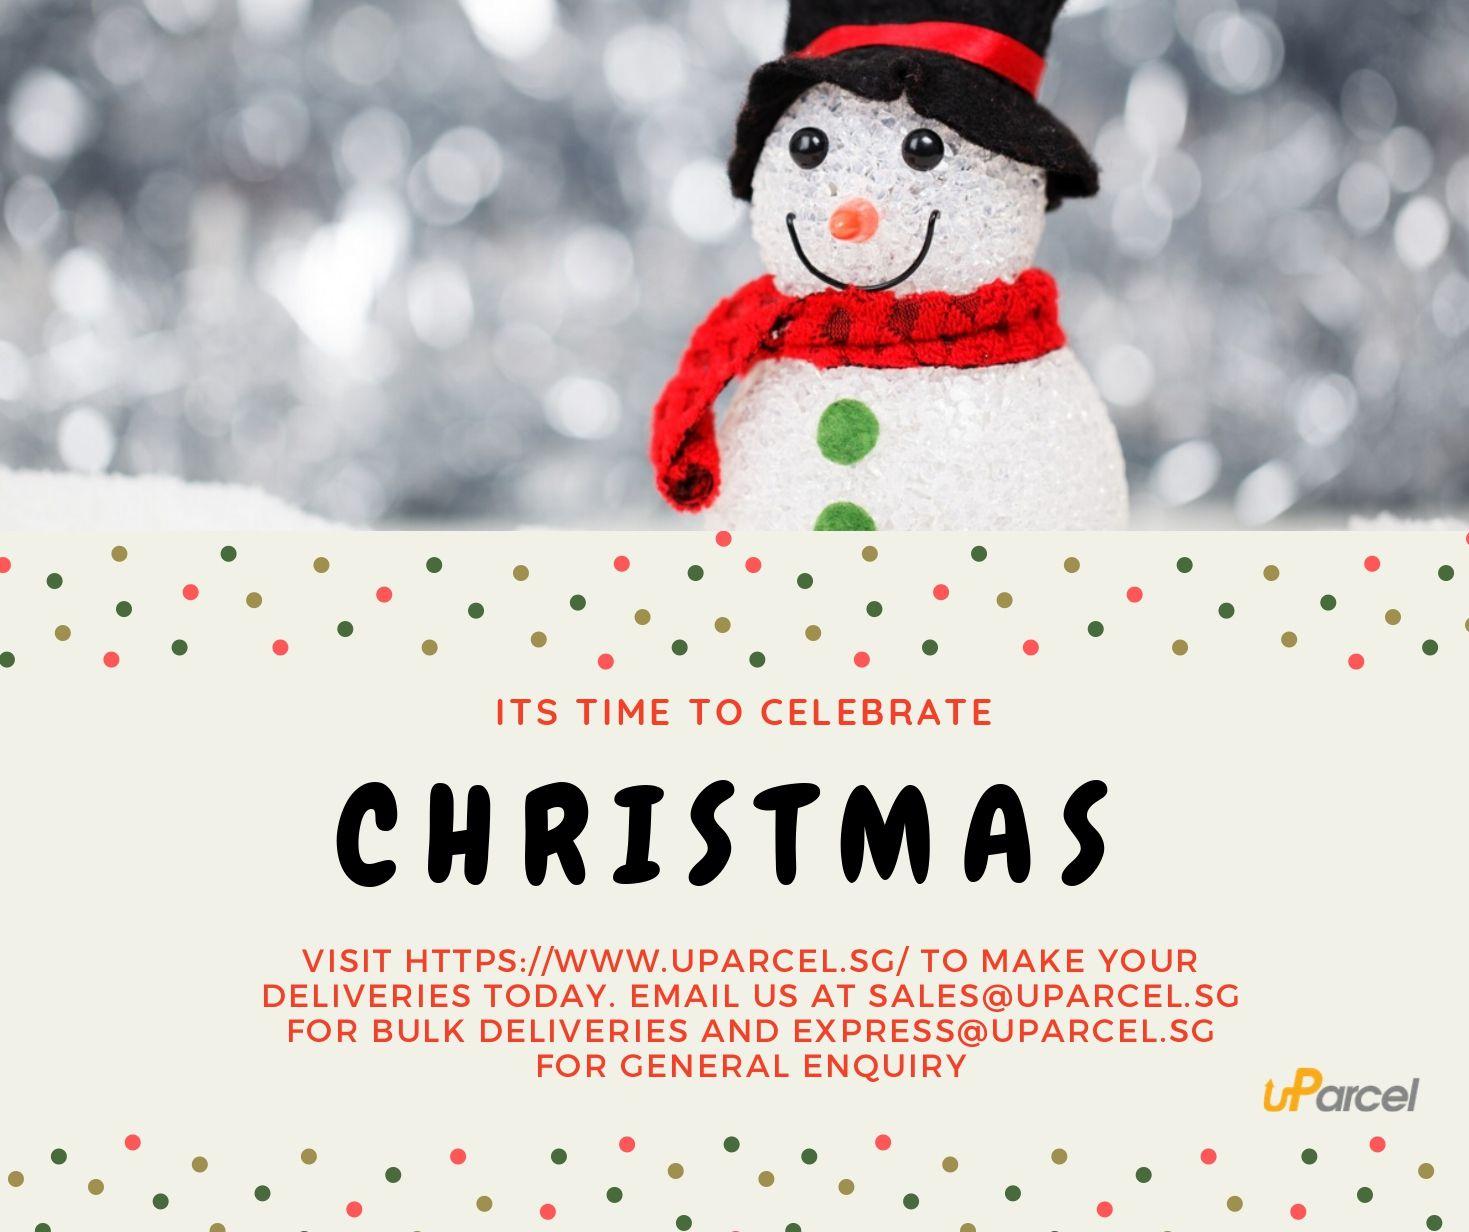 Celebrate Christmas With Uparcel Christmas Celebrations Time To Celebrate Novelty Christmas